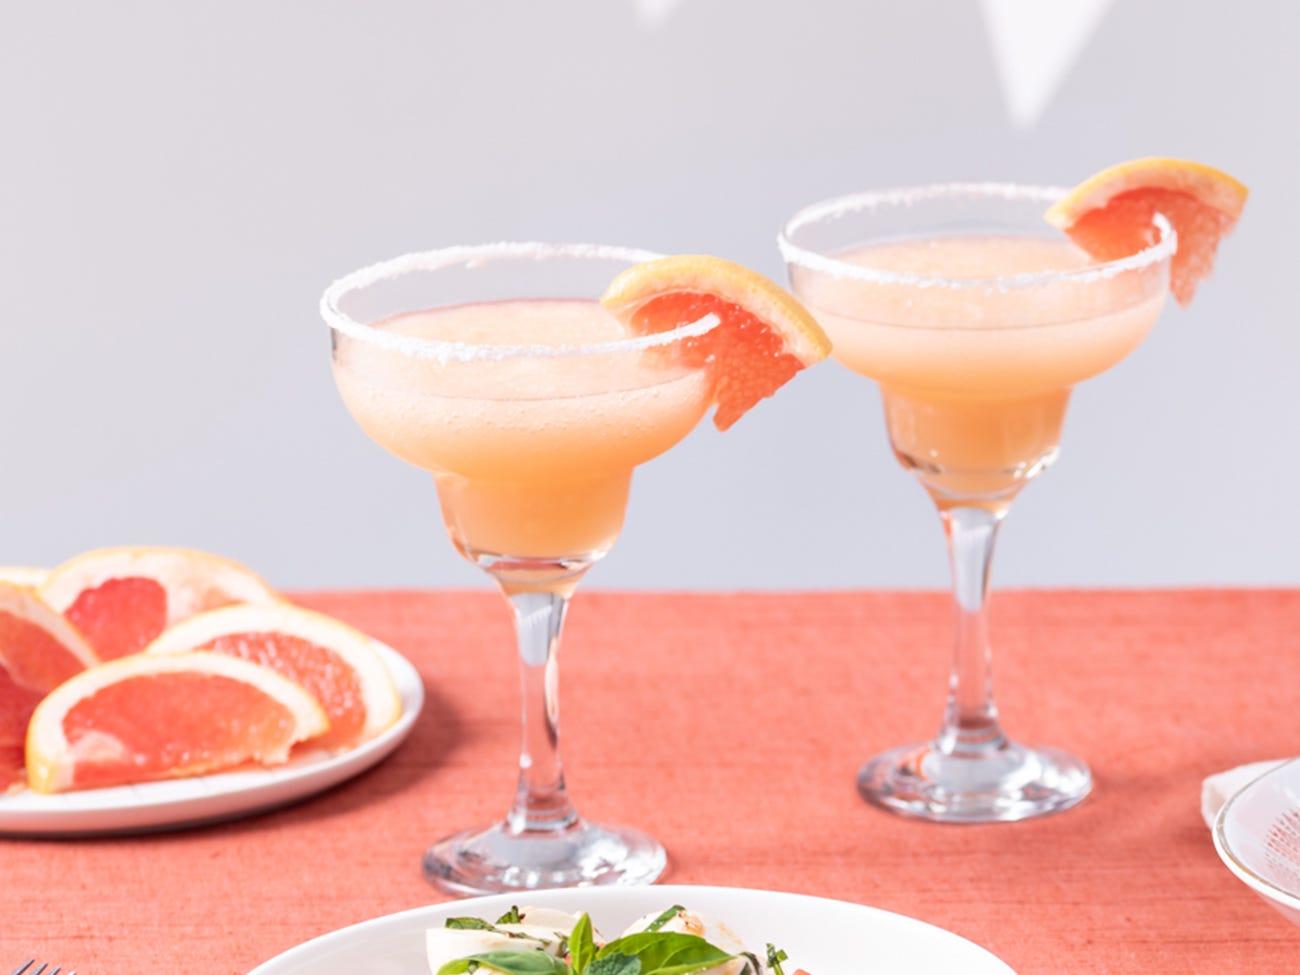 Margarita au pamplemouse